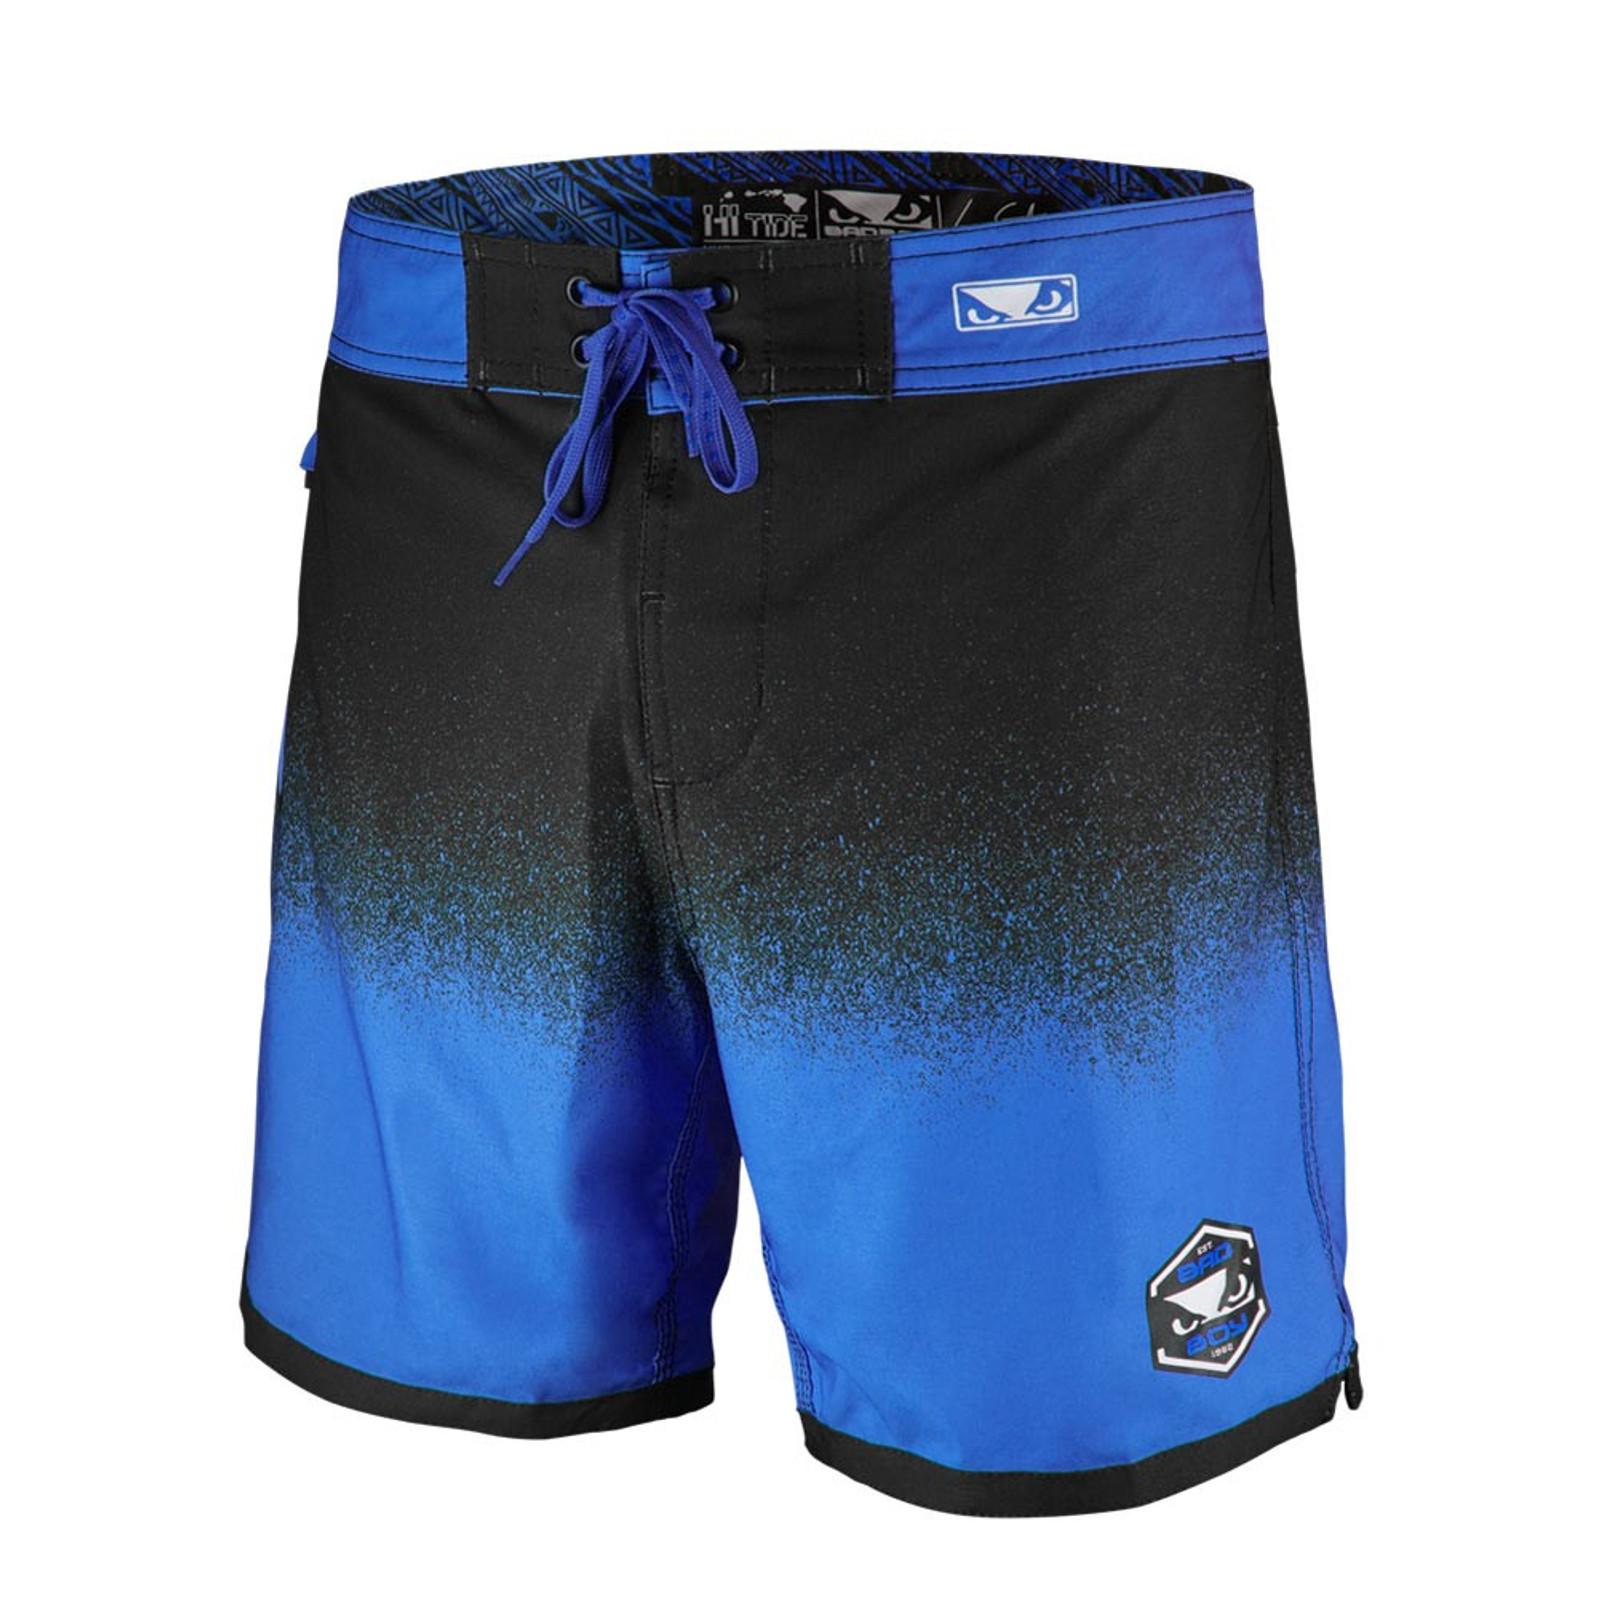 Bad Boy Herren Hi-Tide Hybrid Shorts in Blau